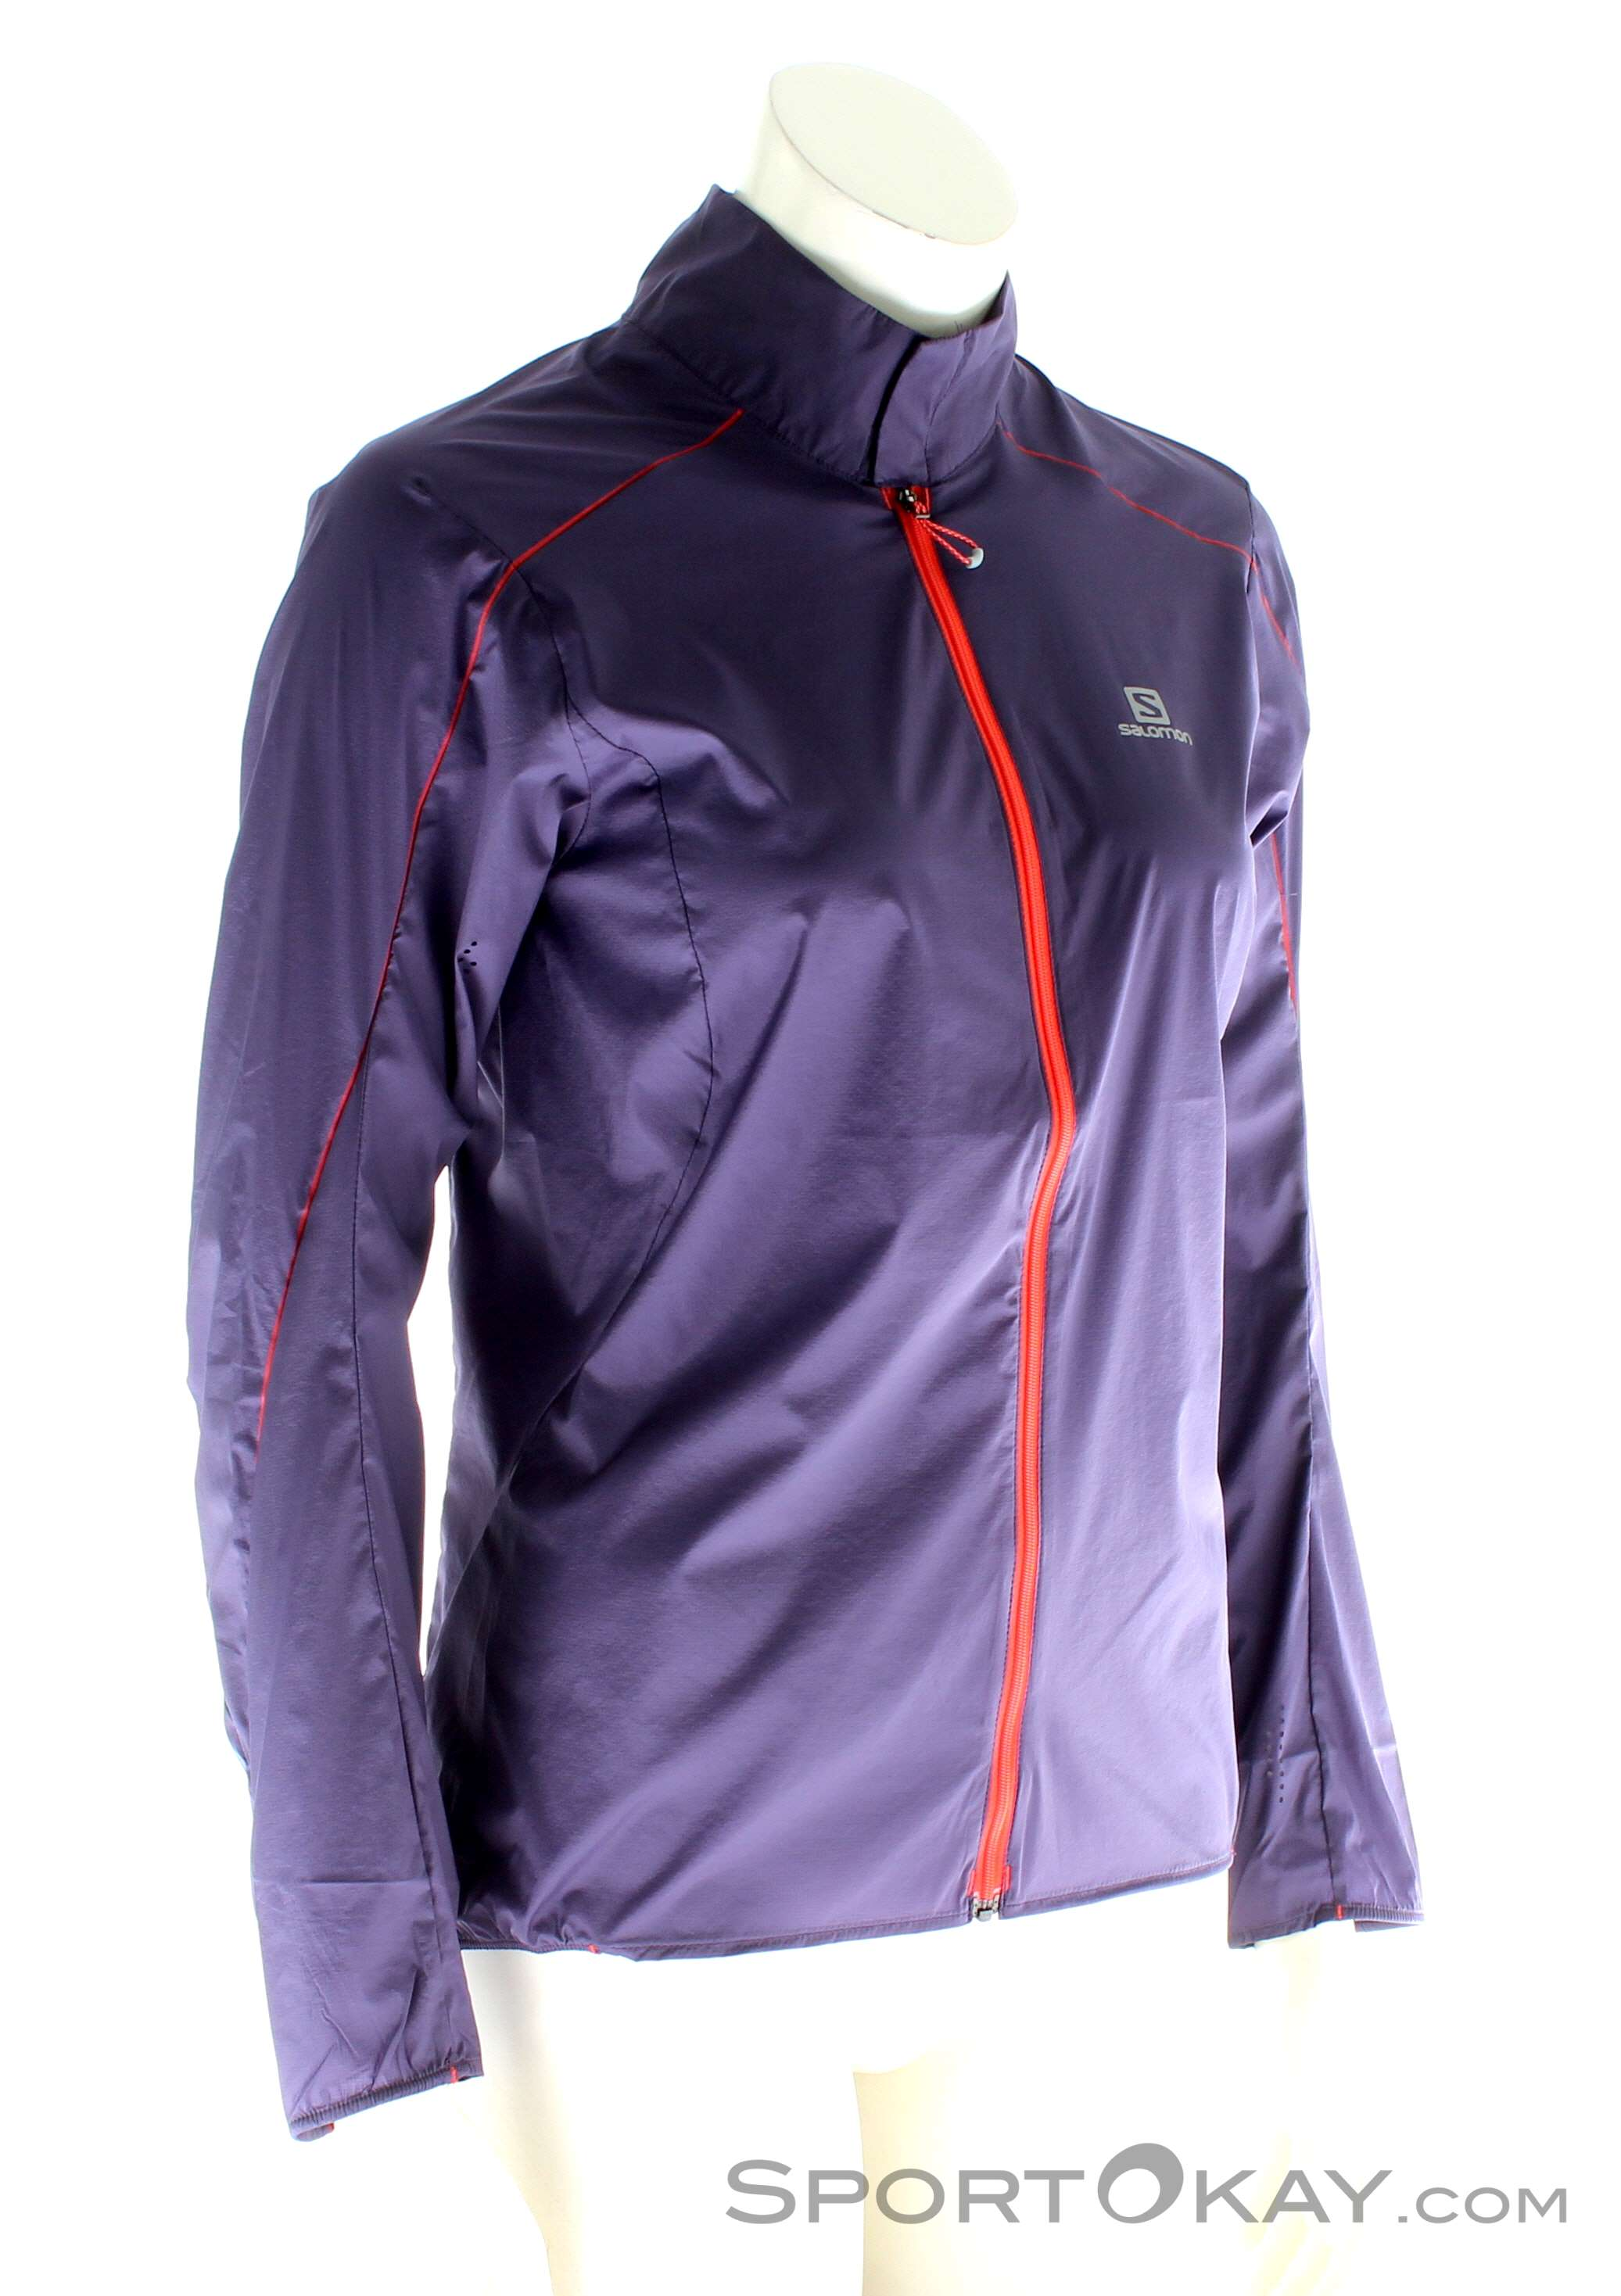 Salomon Salomon S LAB Light Jacket Damen Outdoorjacke